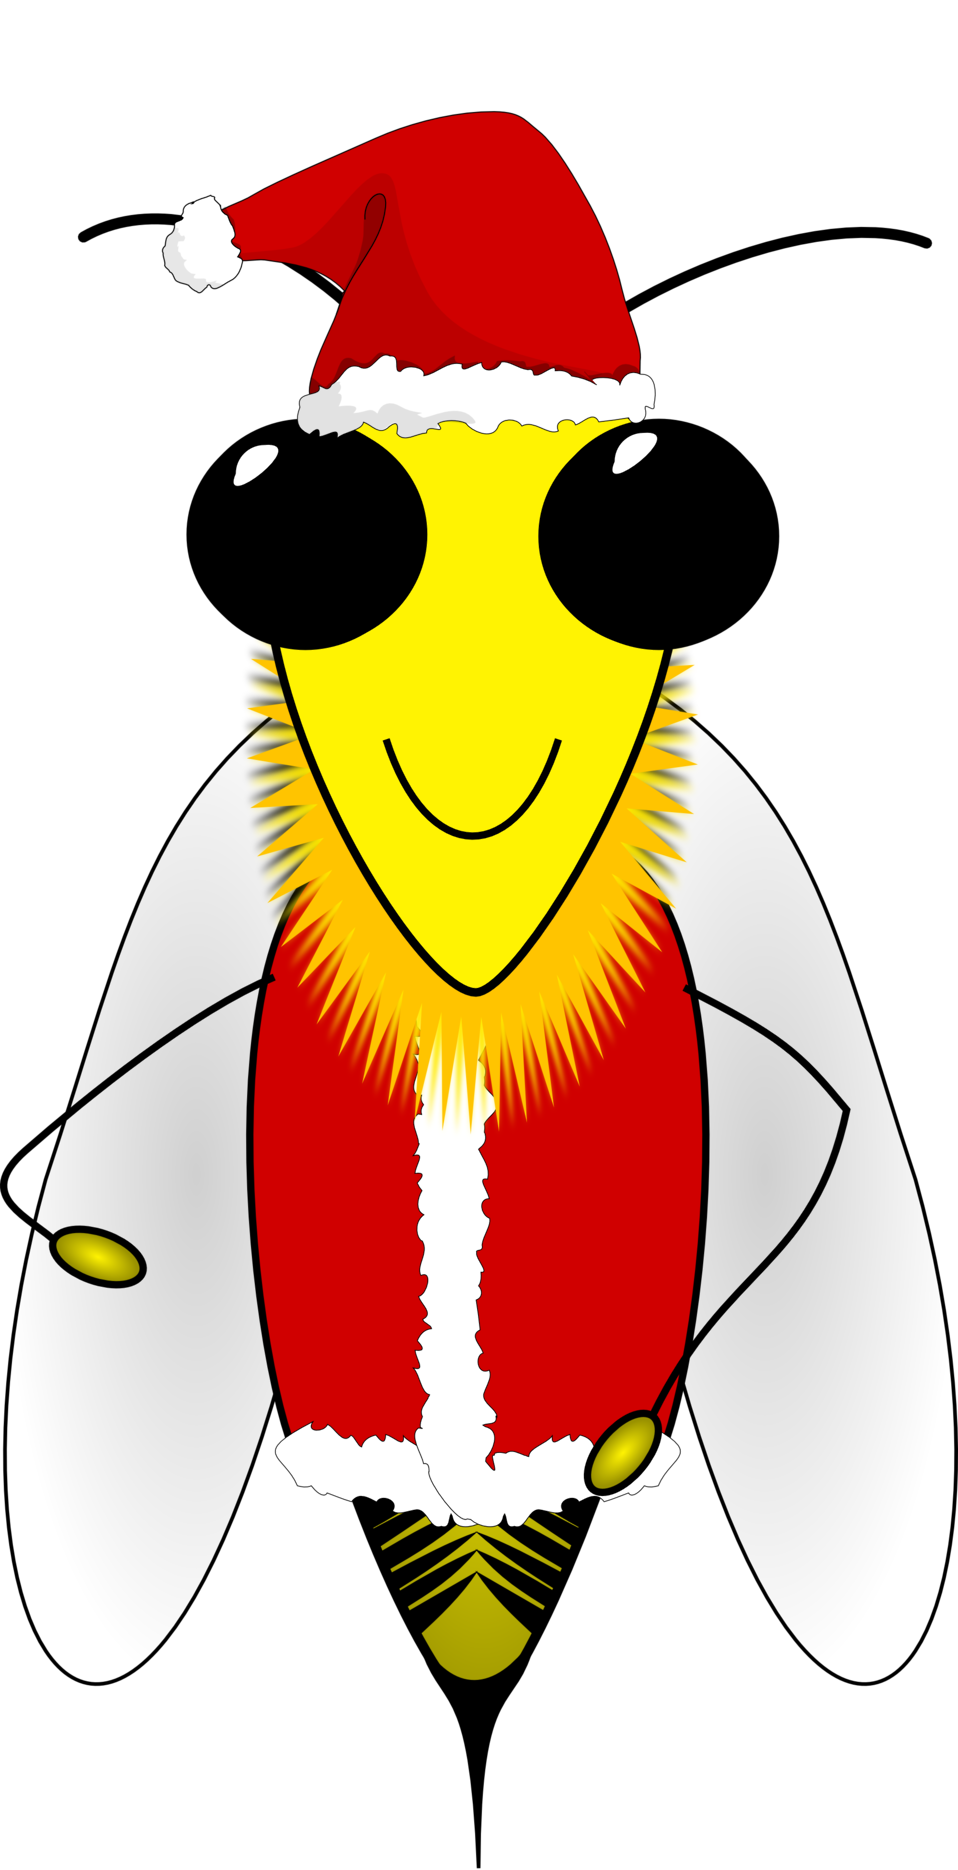 Public domain clip art. Clipart bee character